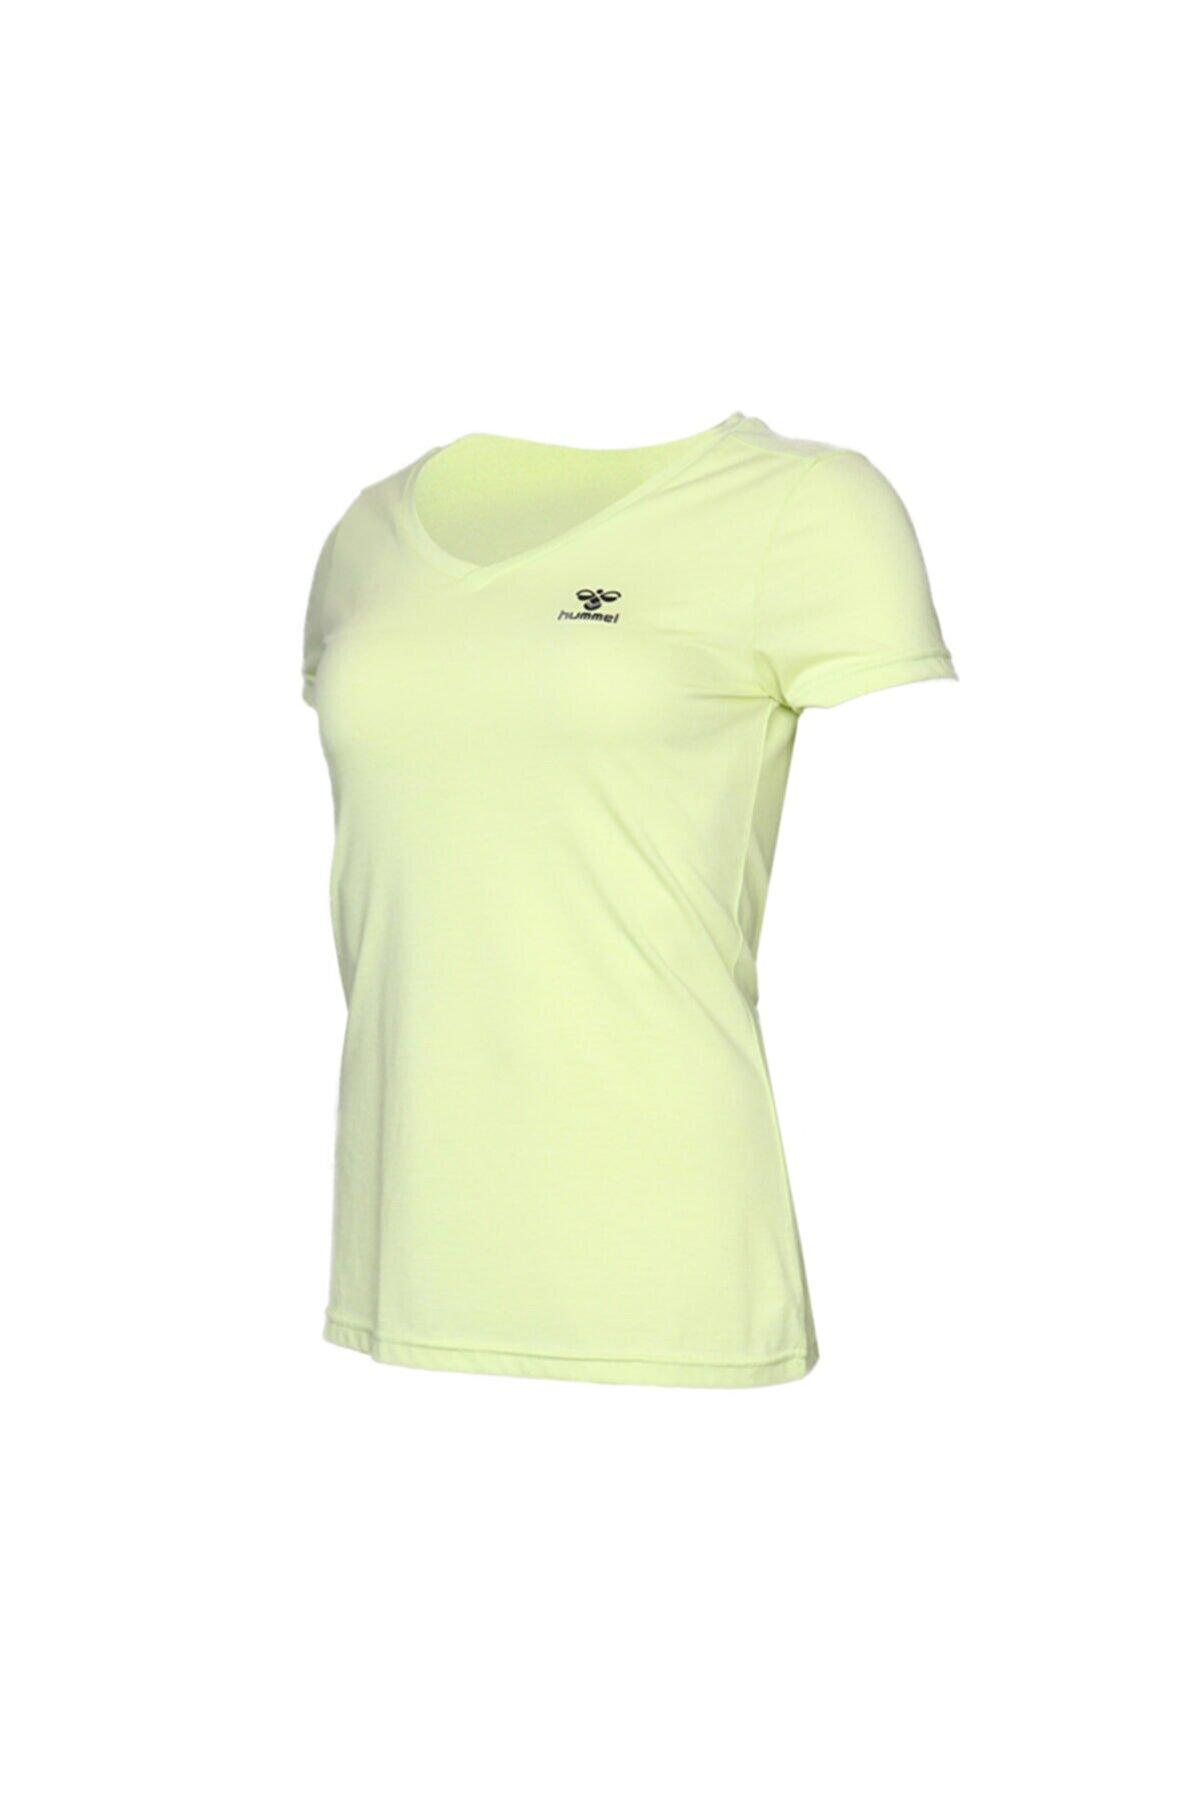 HUMMEL HMLVLORA  T-SHIRT S/S Sarı Kadın T-Shirt 100580760